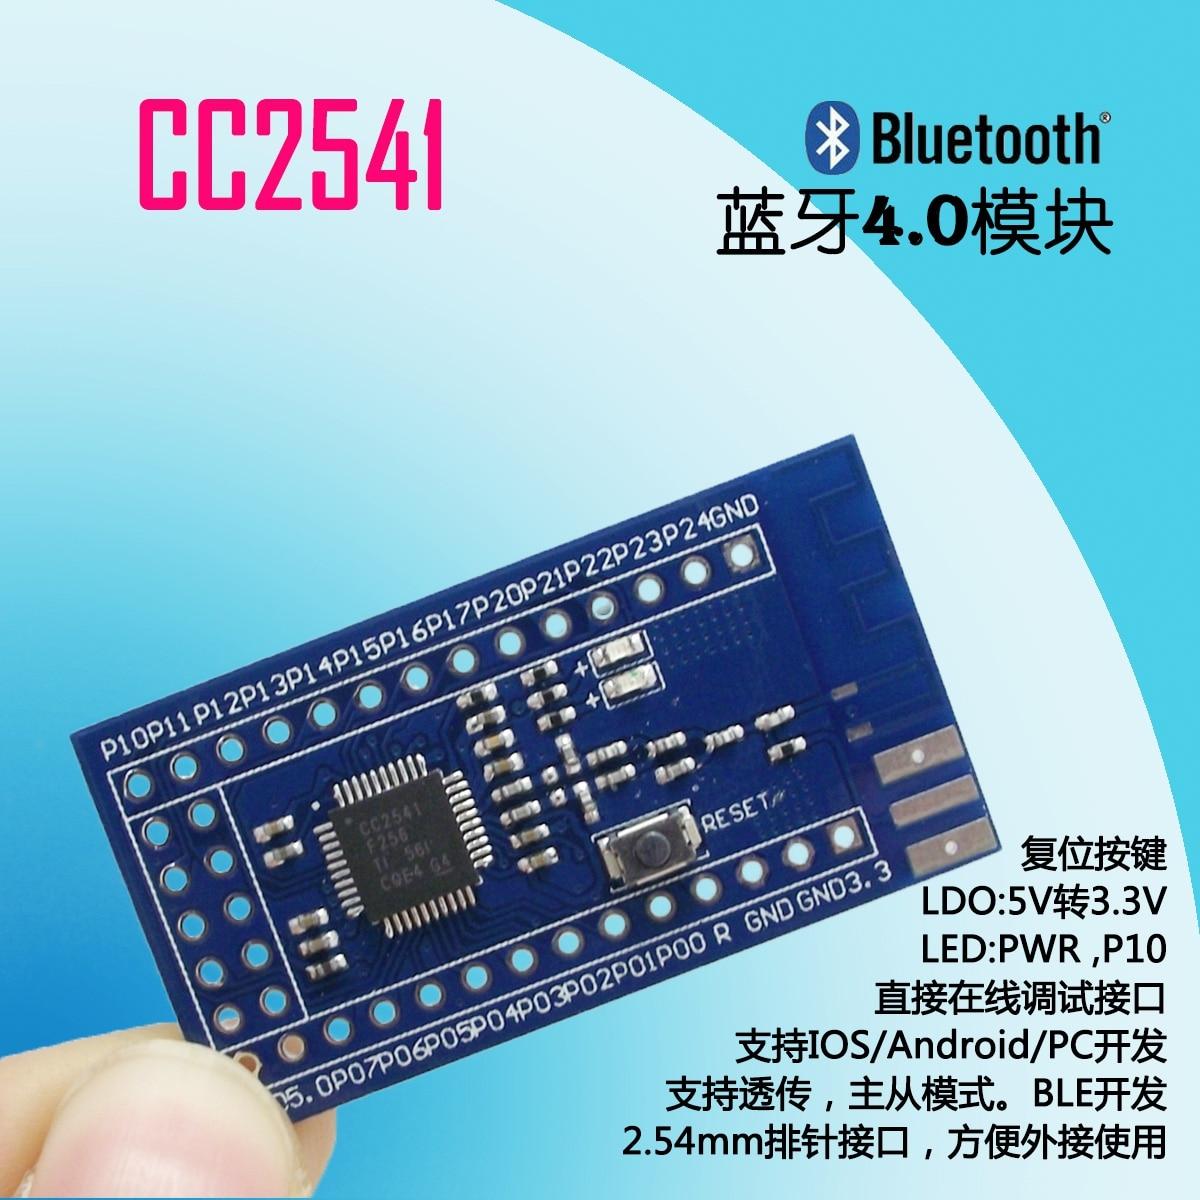 Low power Bluetooth 4 core board PCB SMA antenna CC2540 antenna CC2541 CC254x freeshipping zigbee cc2530 module pcb antenna sma